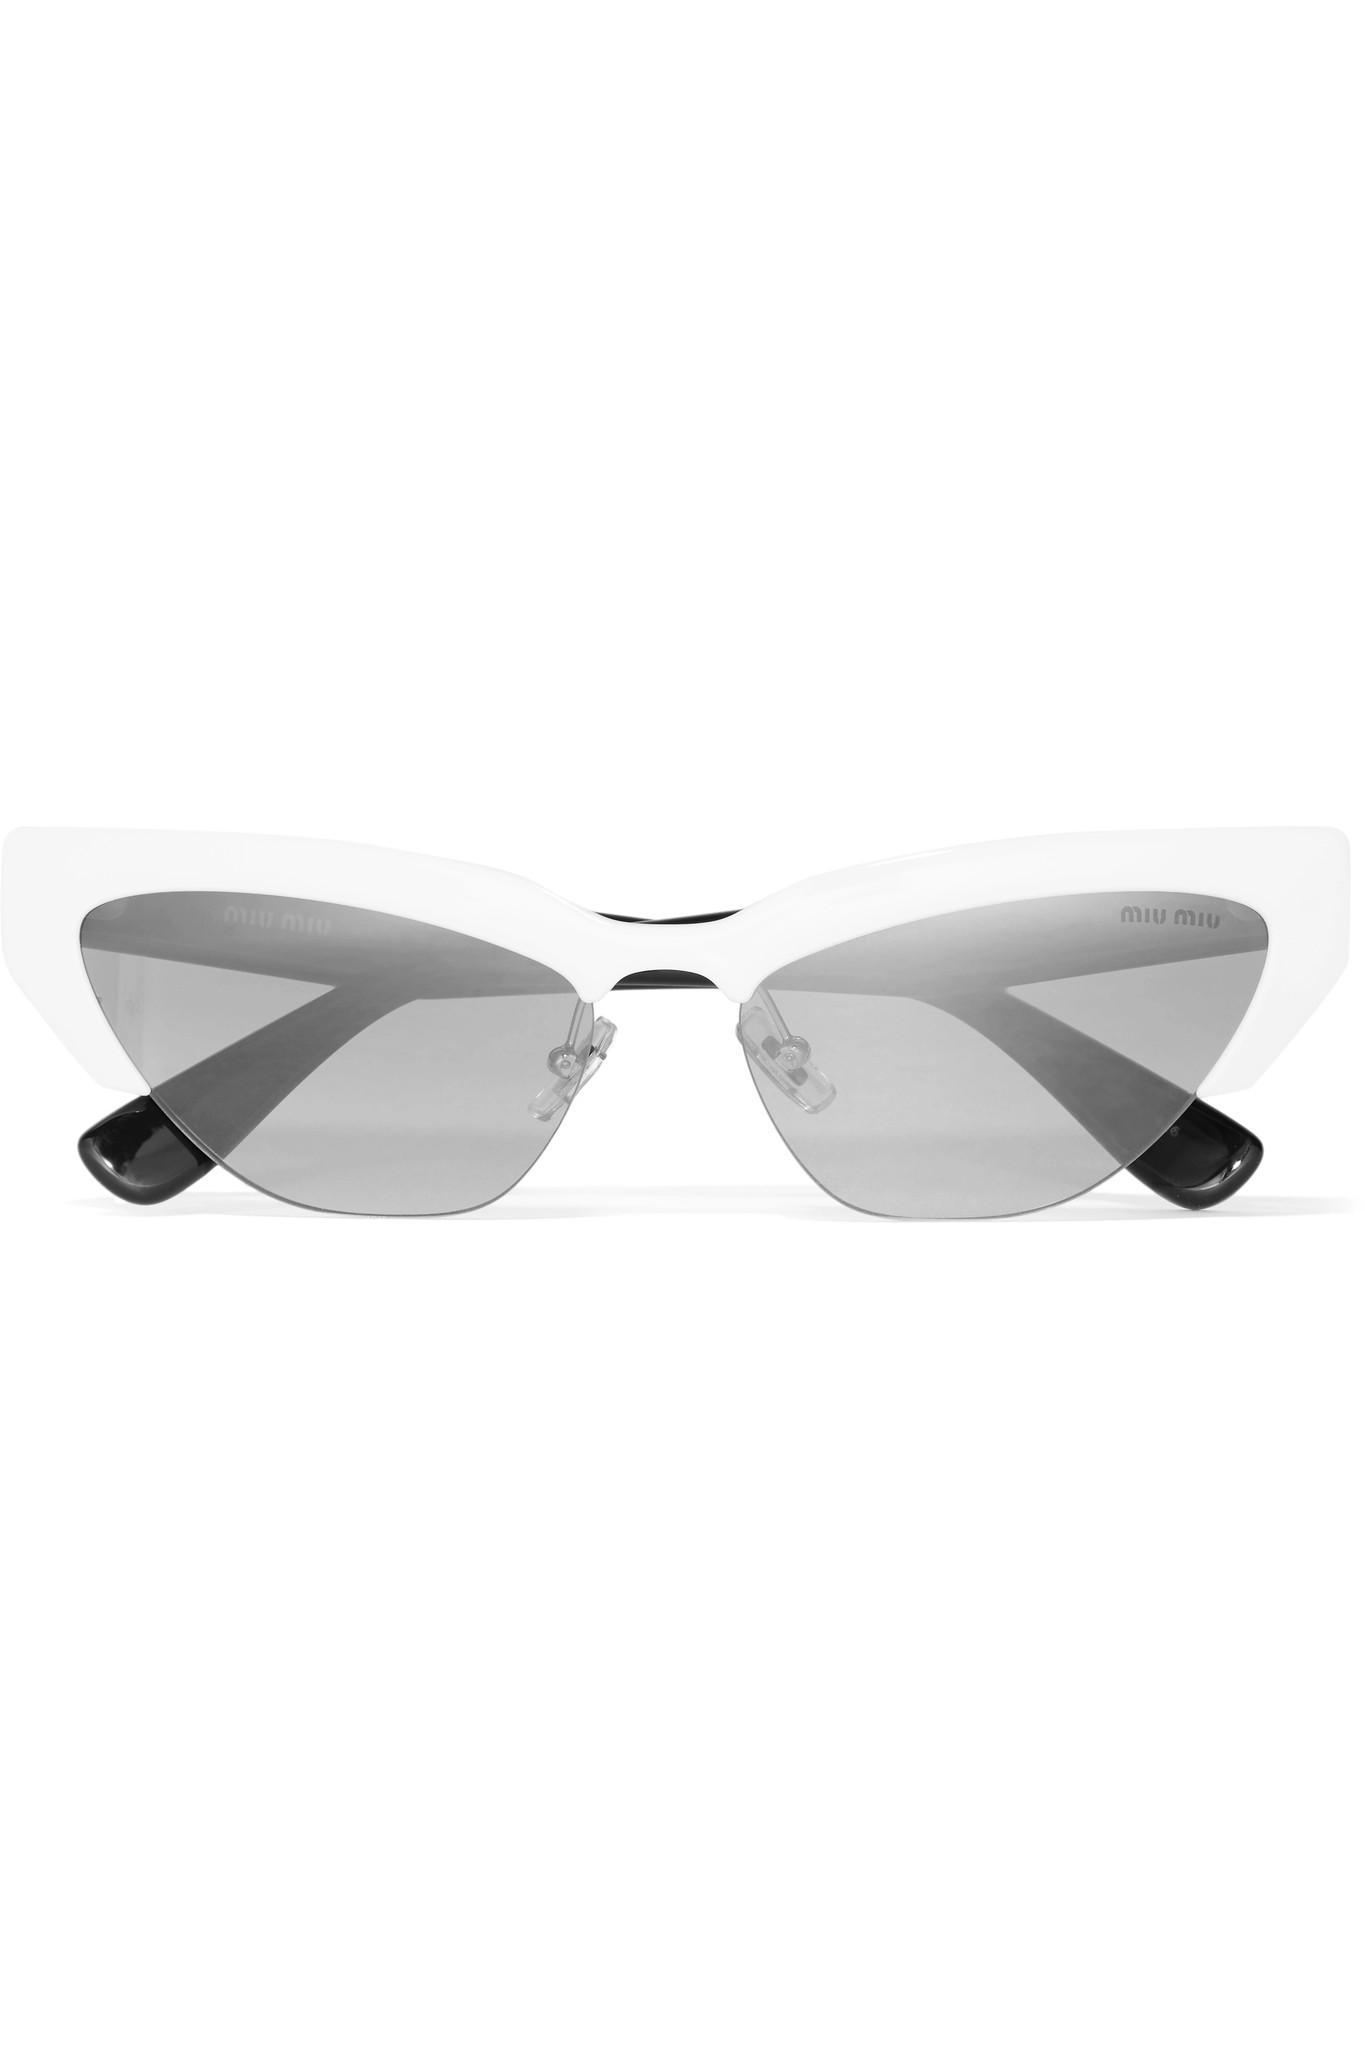 b2544951345 Miu Miu 0mu 04us 59mm Cat Eye Mirror Sunglasses in Gray - Save 28 ...